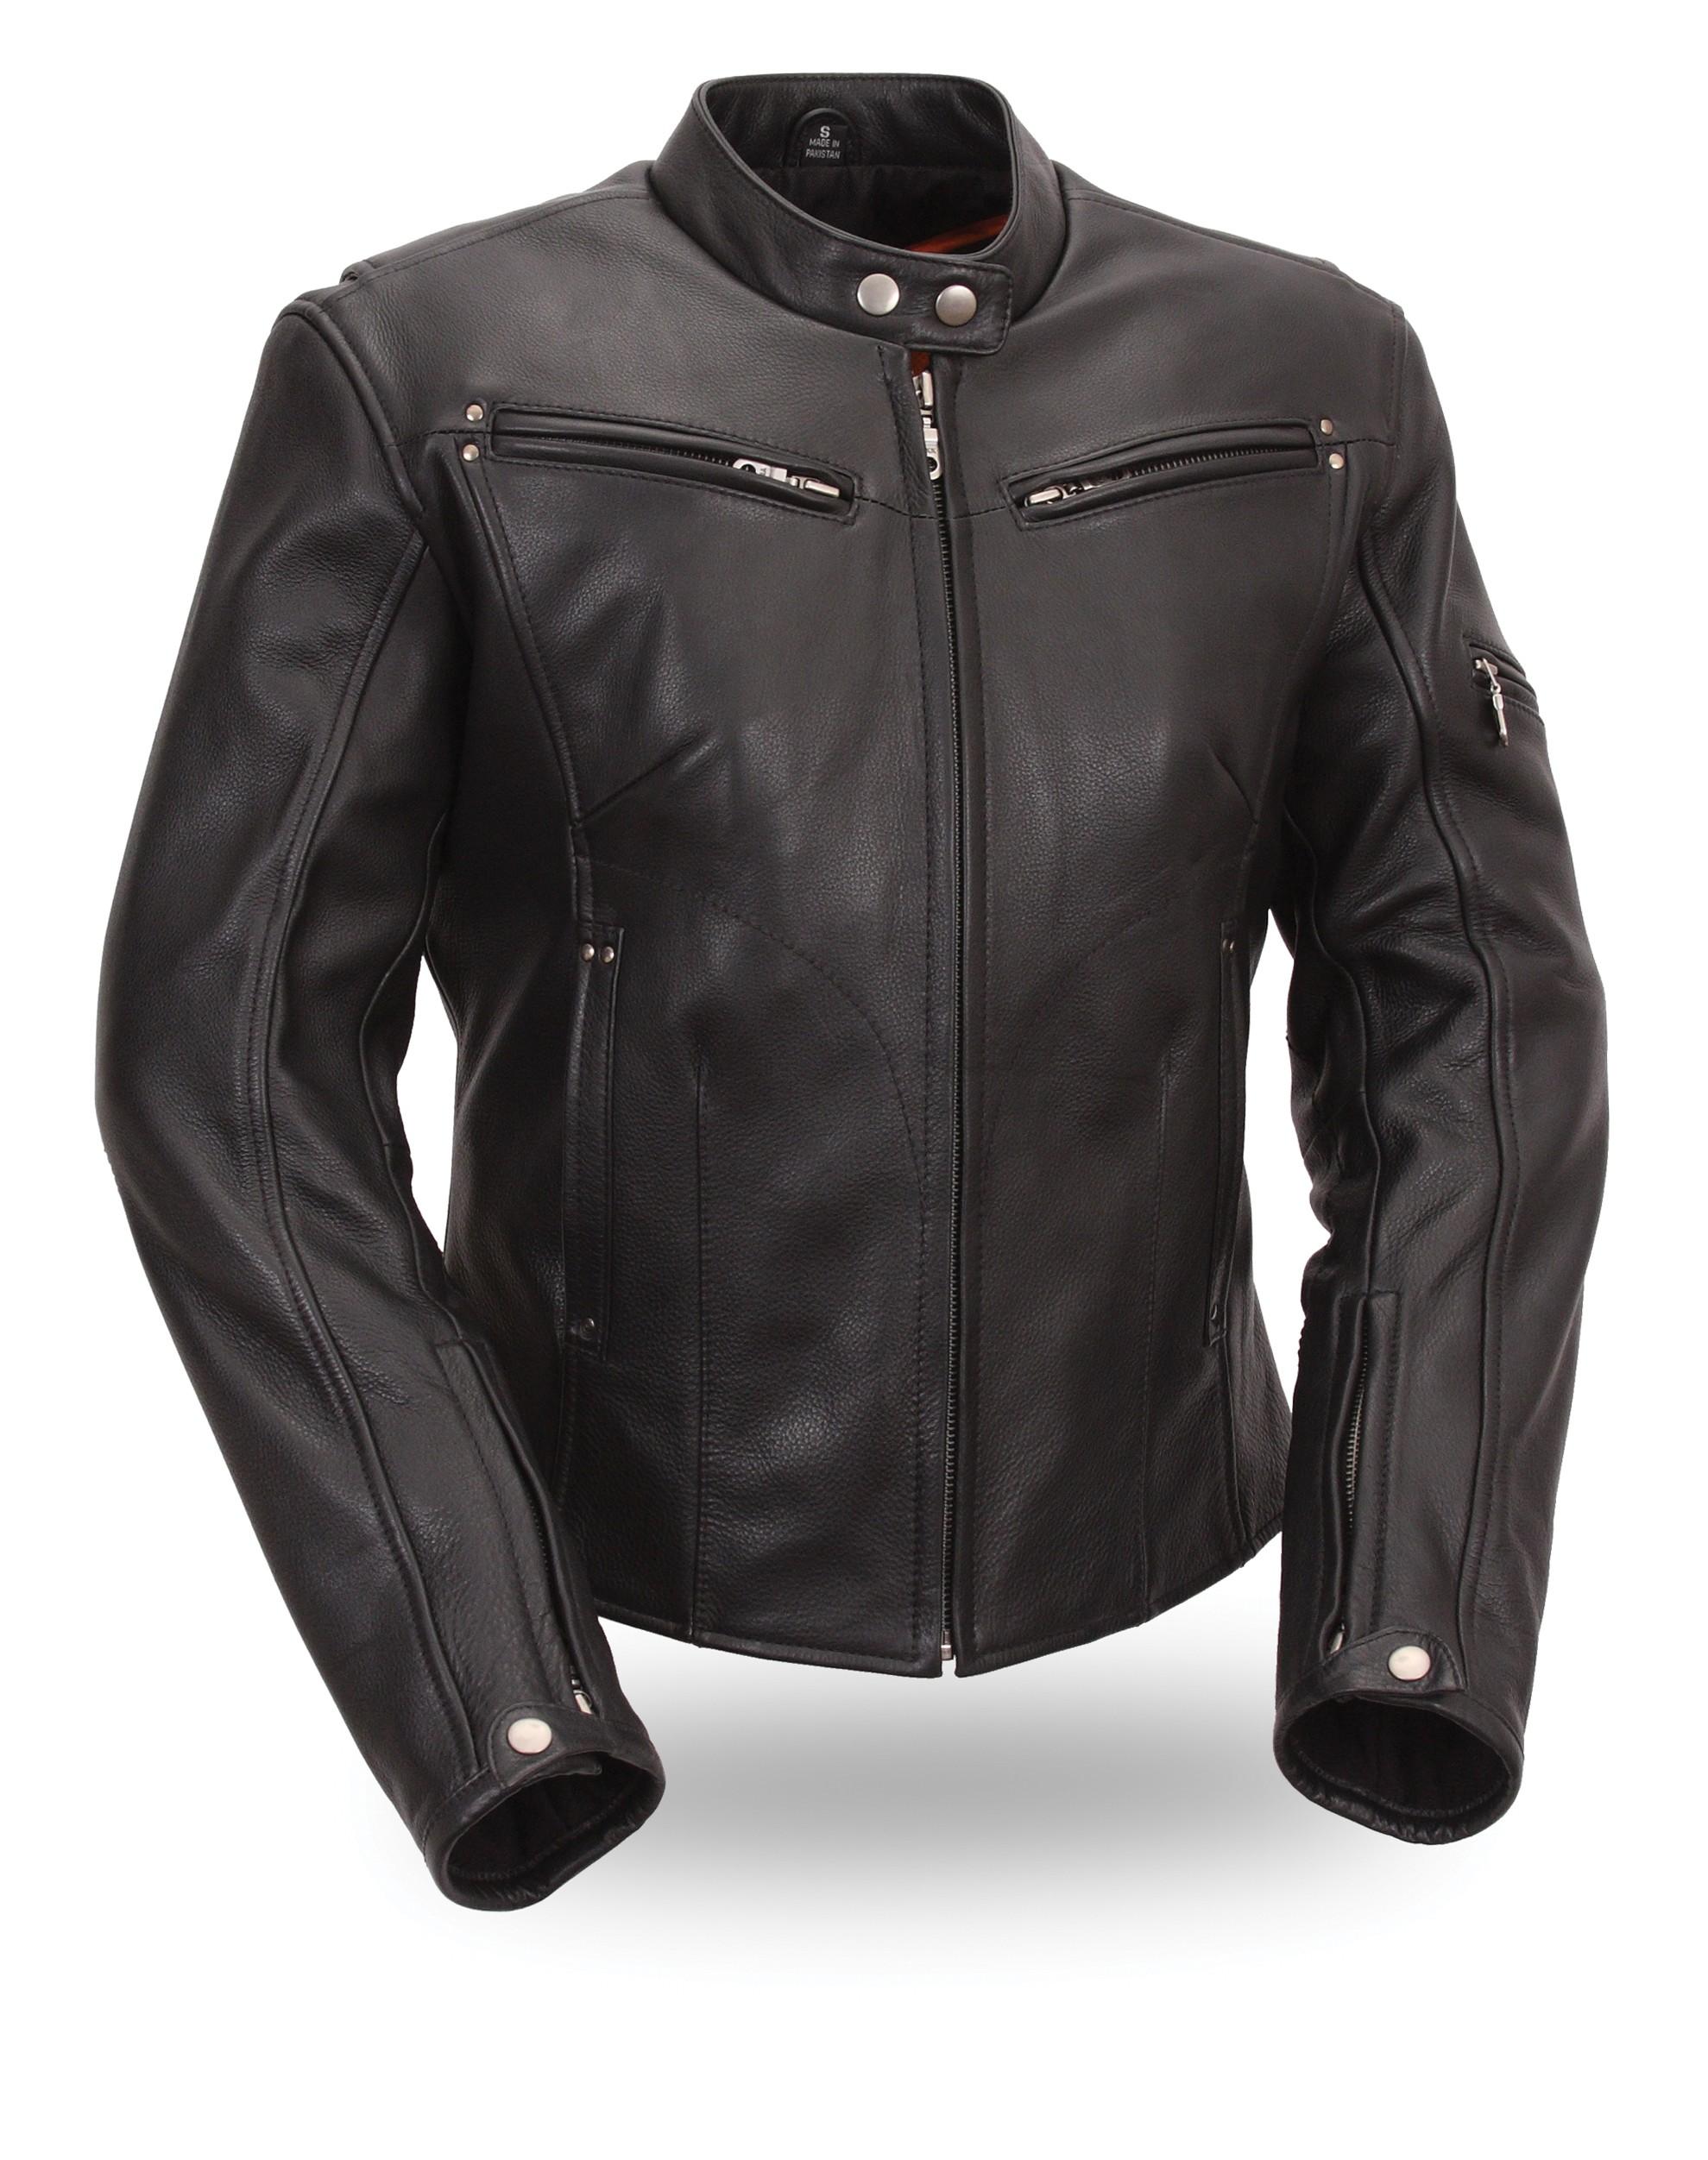 Women's Sleek Vented Scooter Jacket FIL157NOCZ